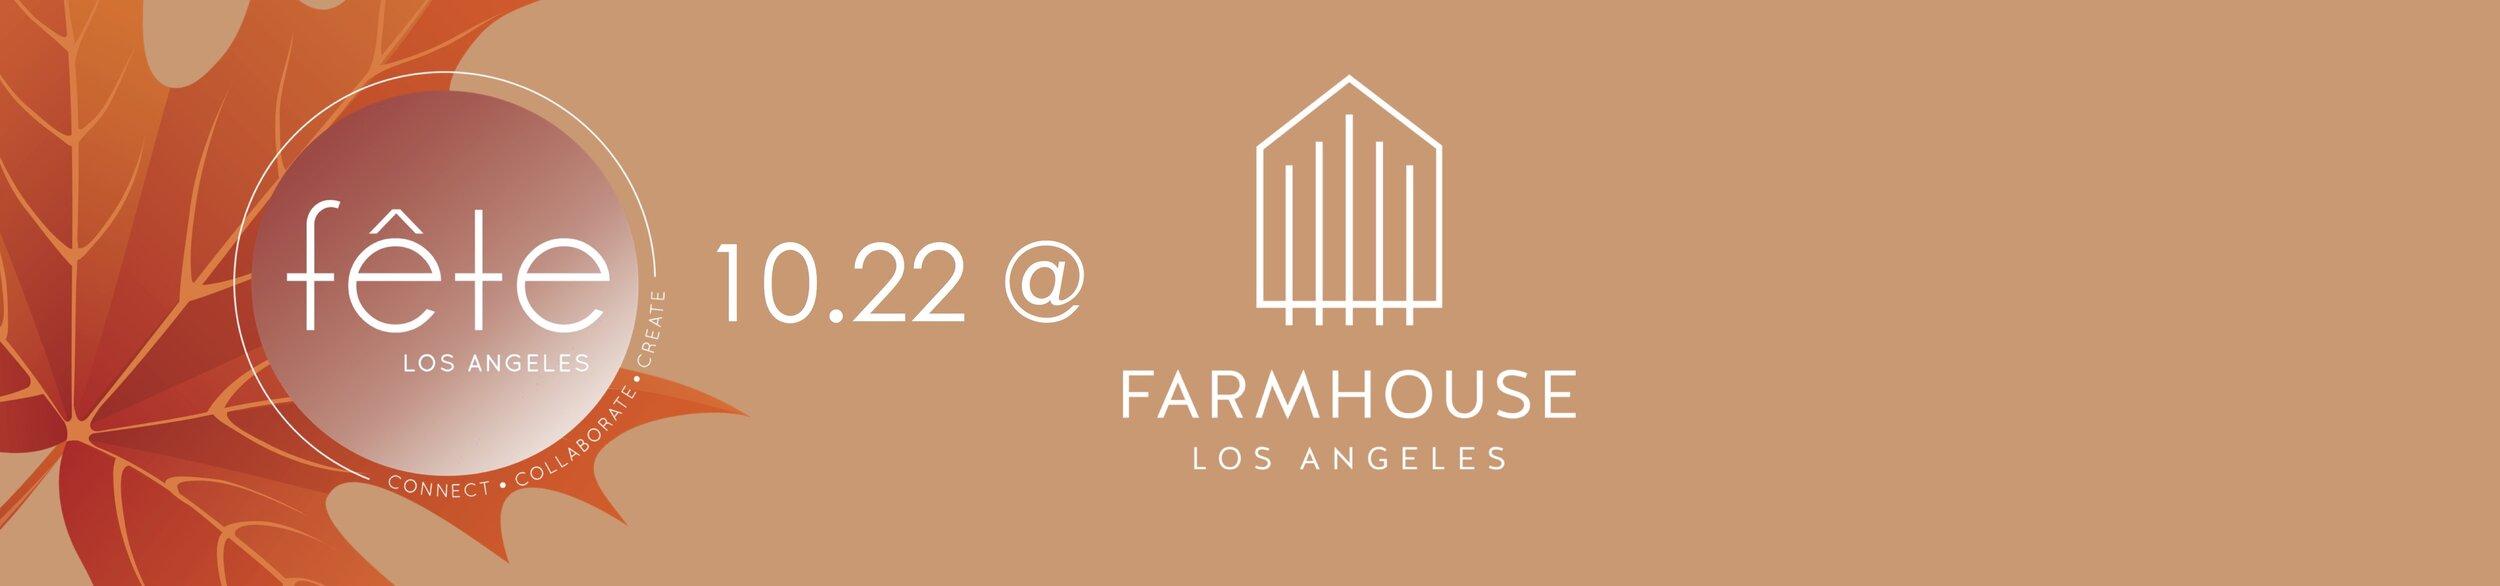 fete @ Farmhouse banner.jpg